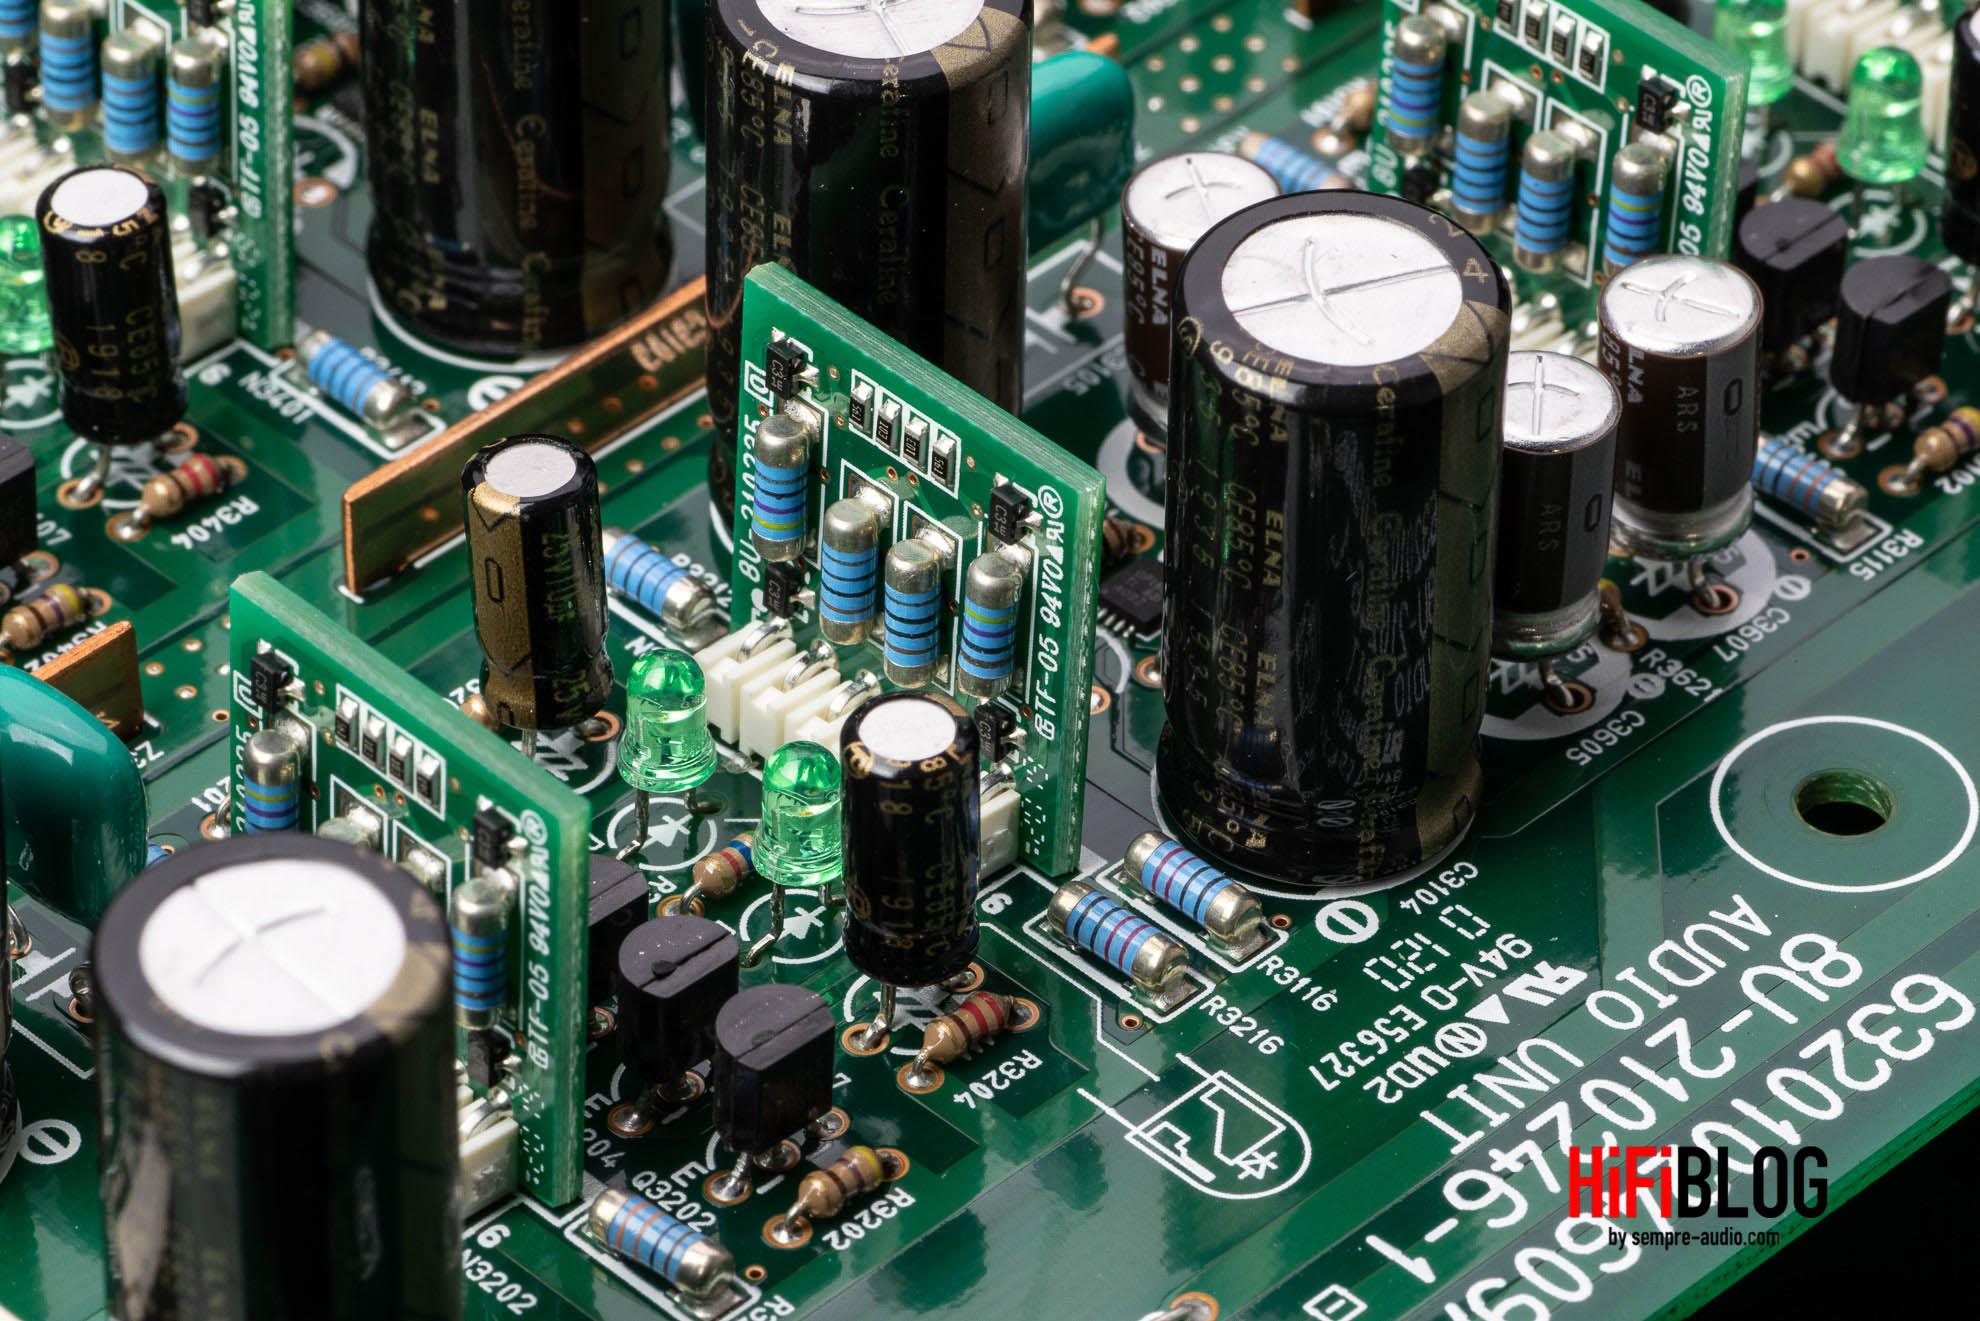 Marantz Model 30 Integrated Amplifier and SACD 30n Network SACD Player 21